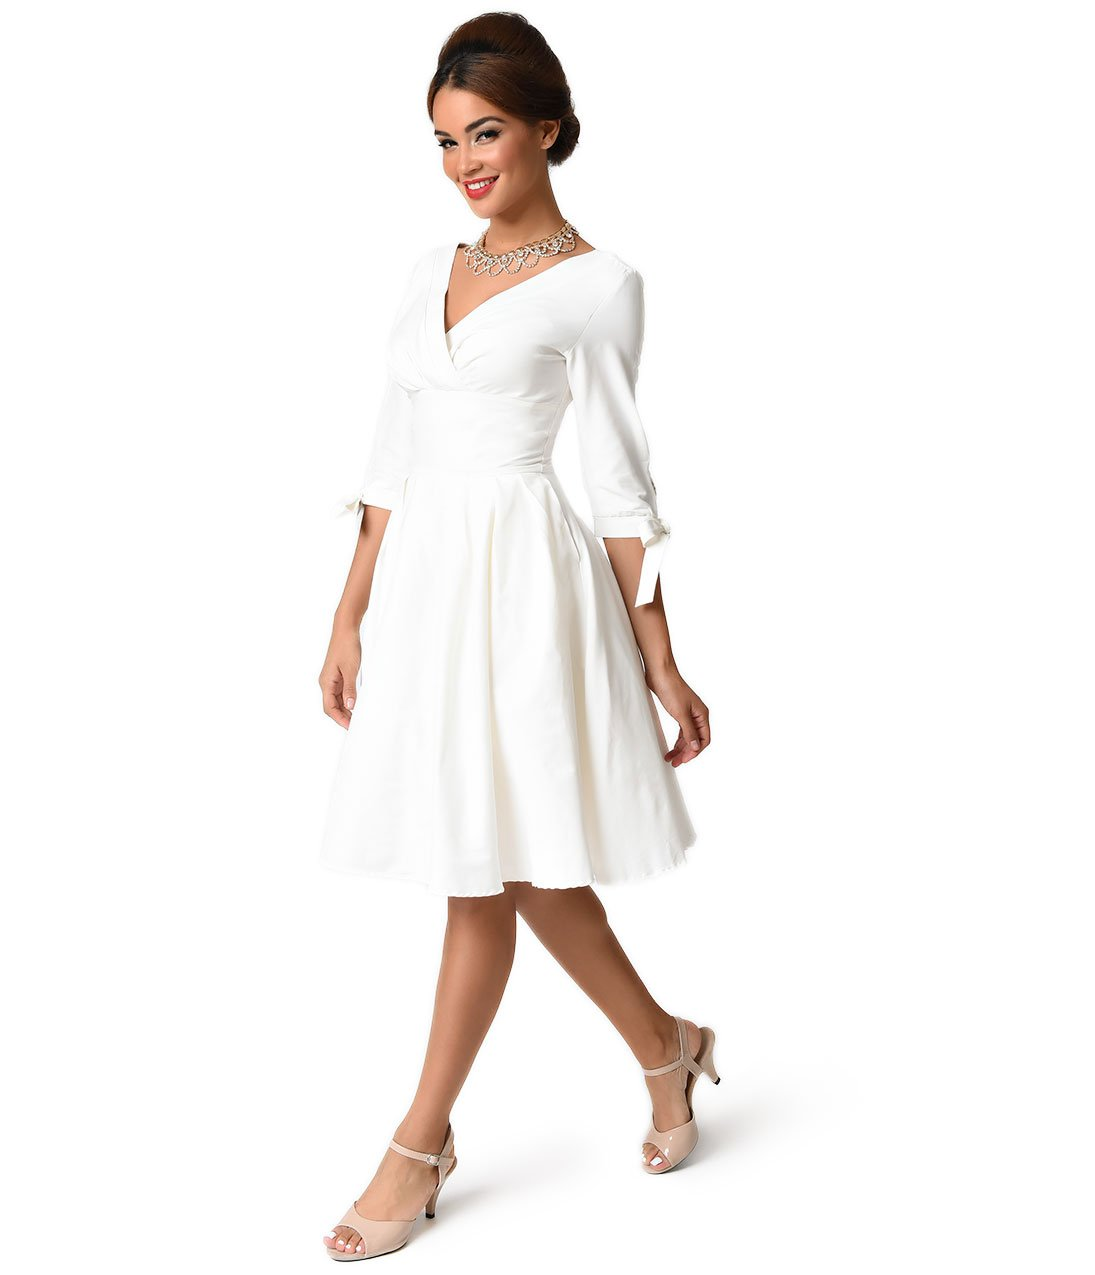 Unique Vintage 1950s Style White Three-Quarter Sleeve Diana Swing Dress by Unique Vintage